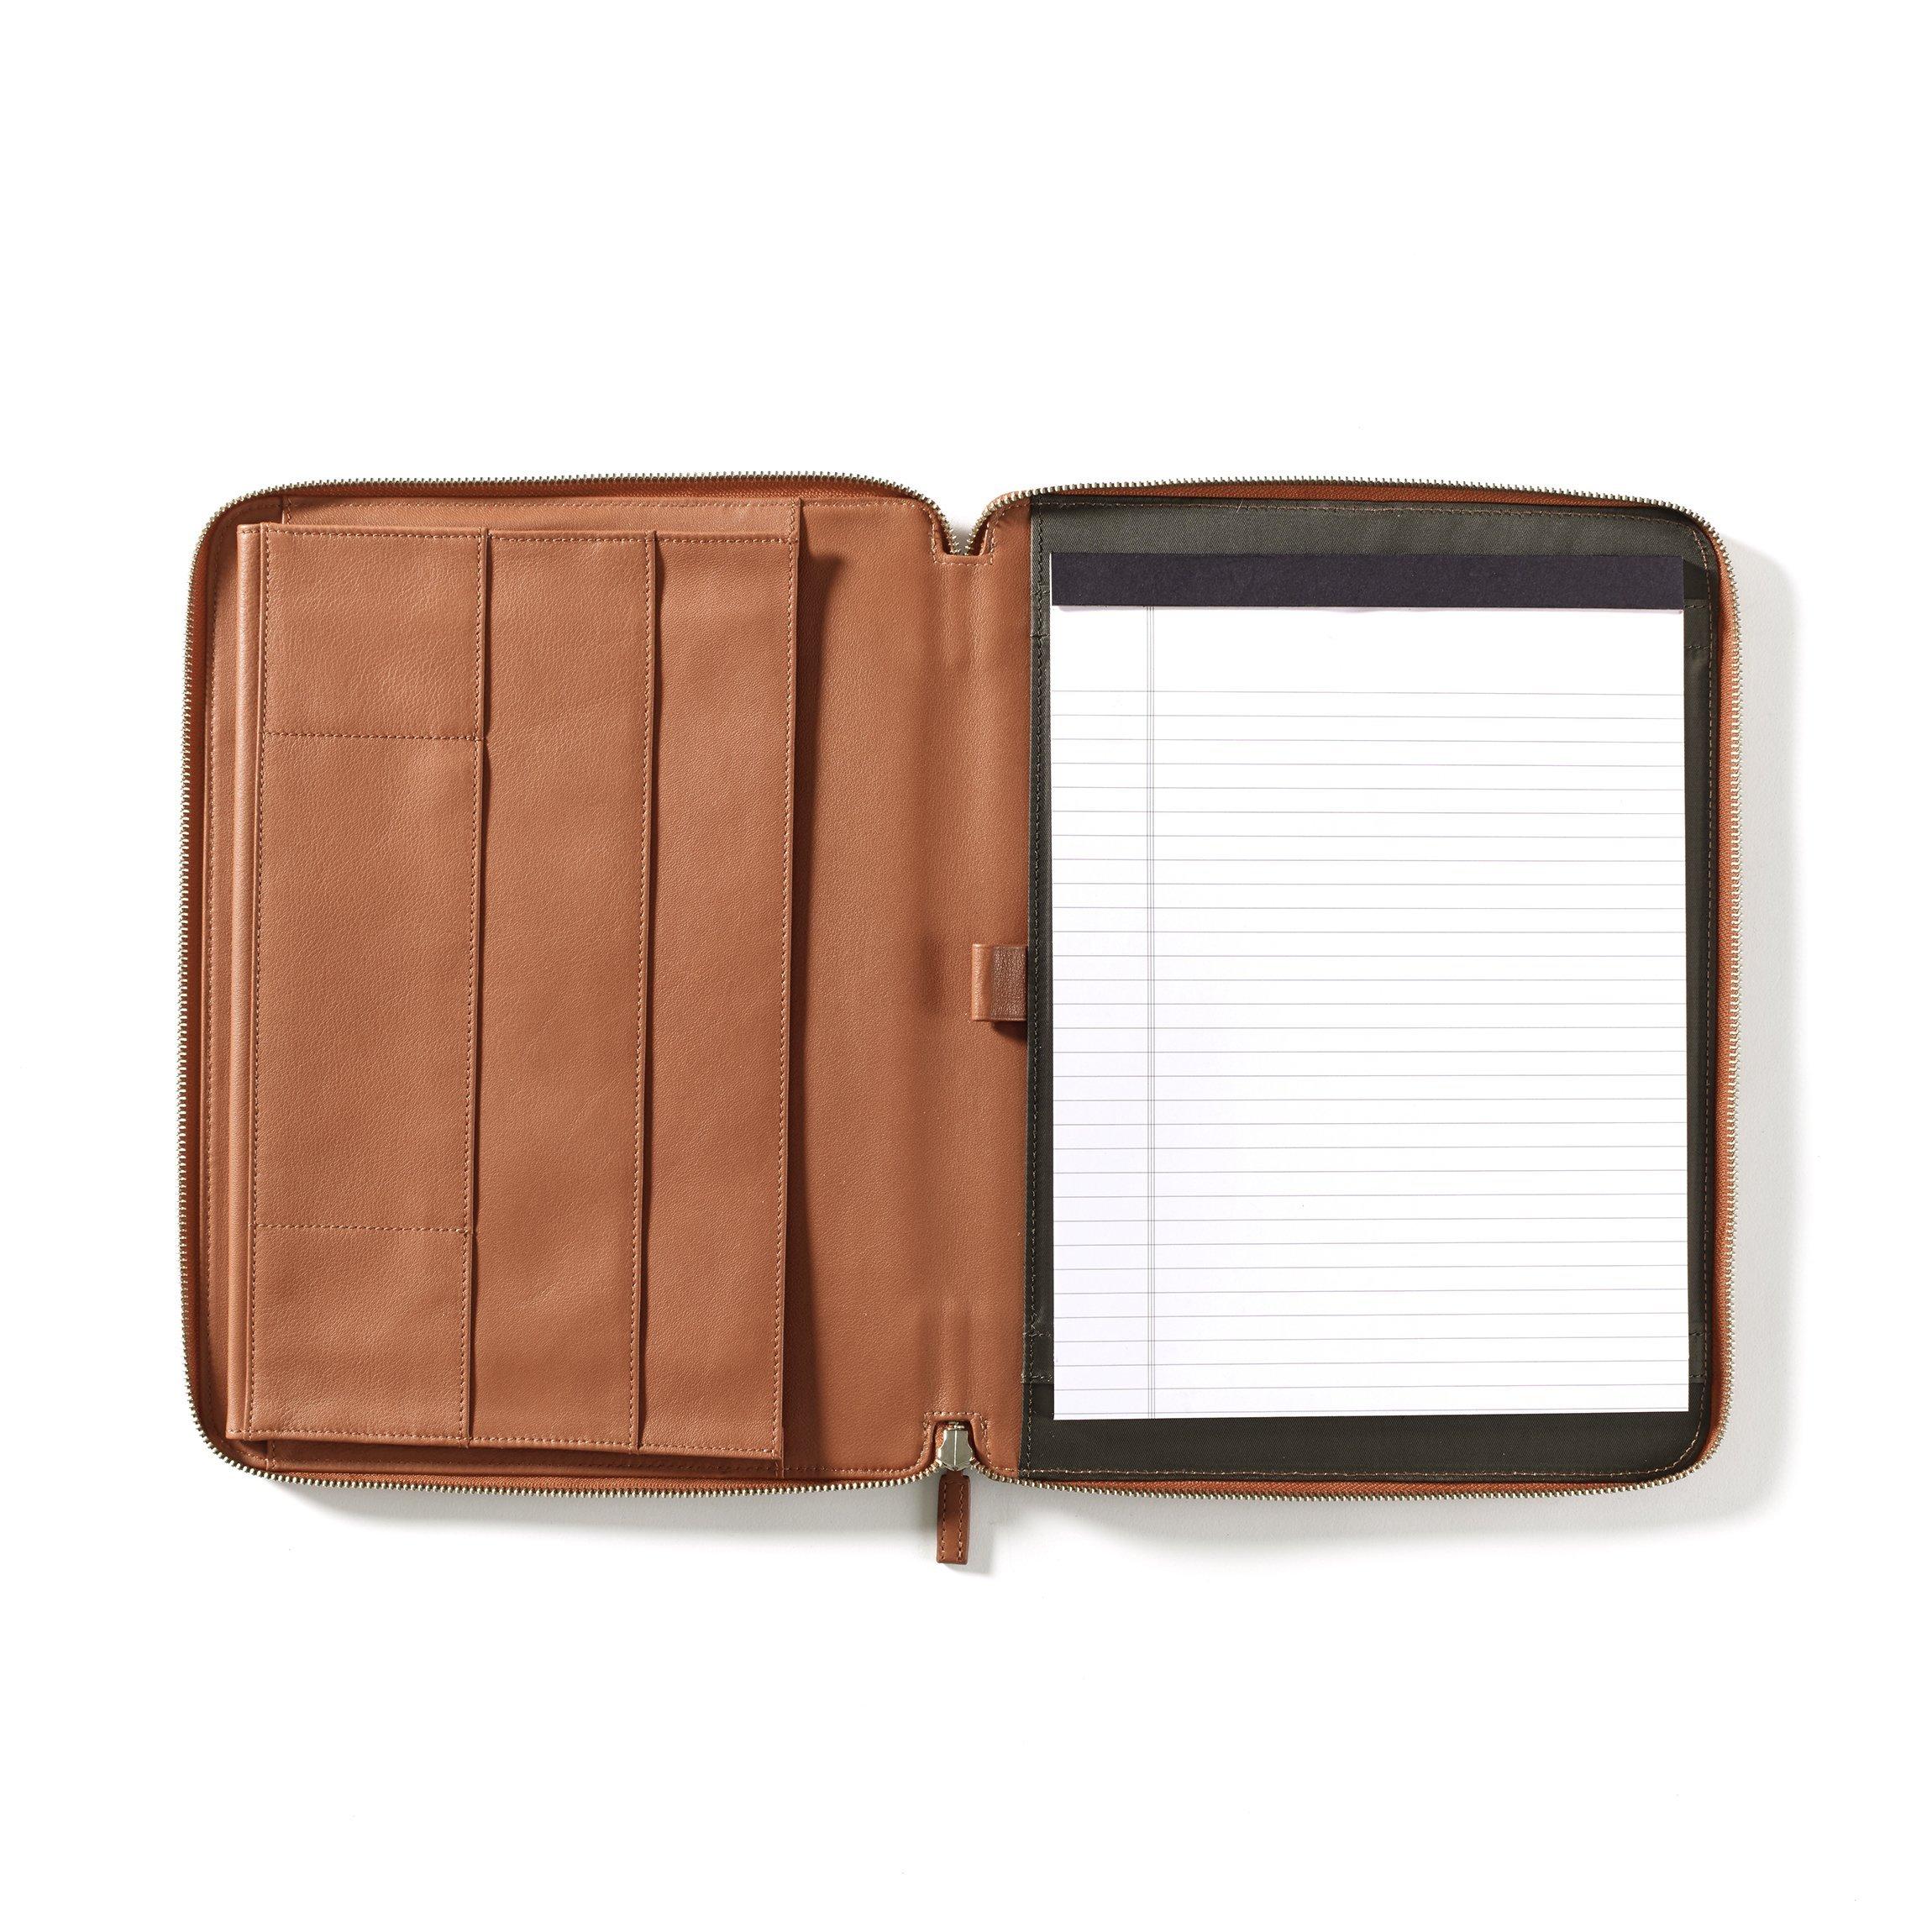 Leatherology Executive Zippered Portfolio with Interior iPad Pocket - Full Grain Leather - Cognac (brown)